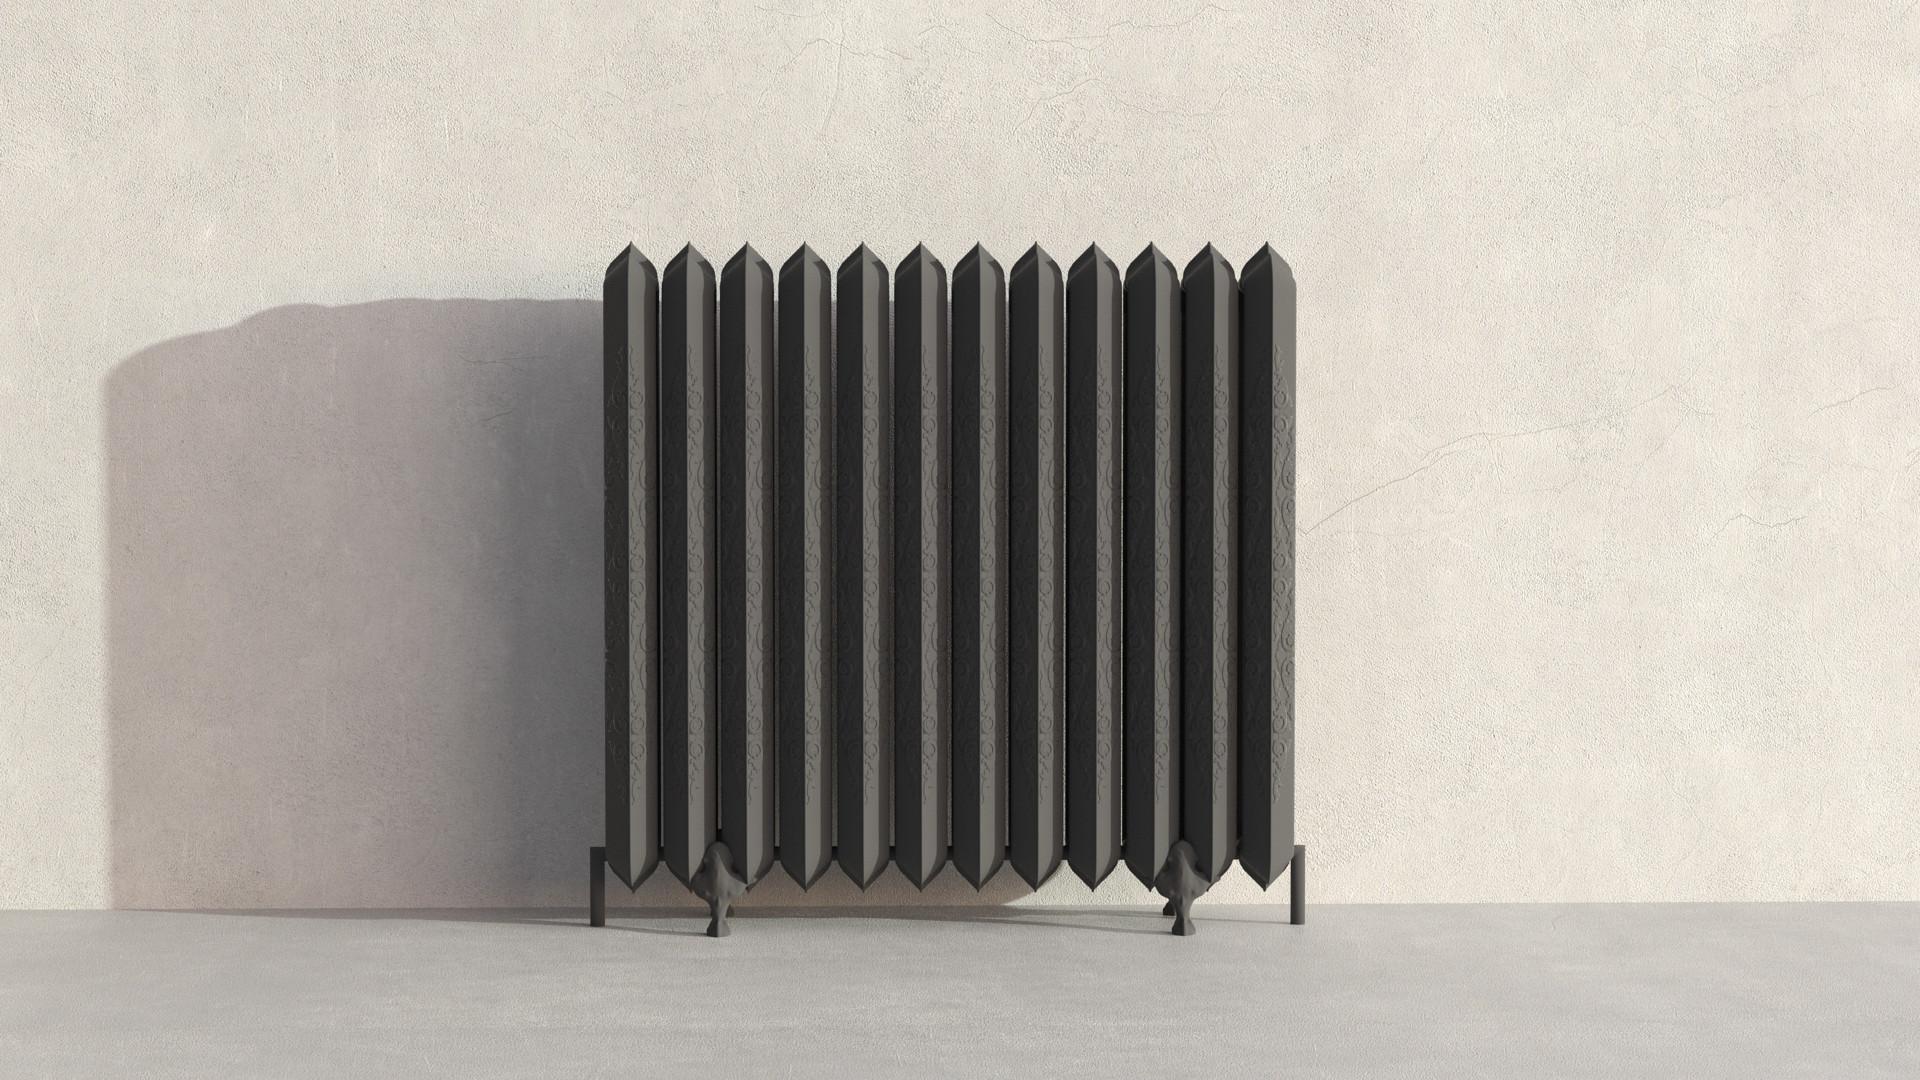 Duane kemp cast iron radiator 02